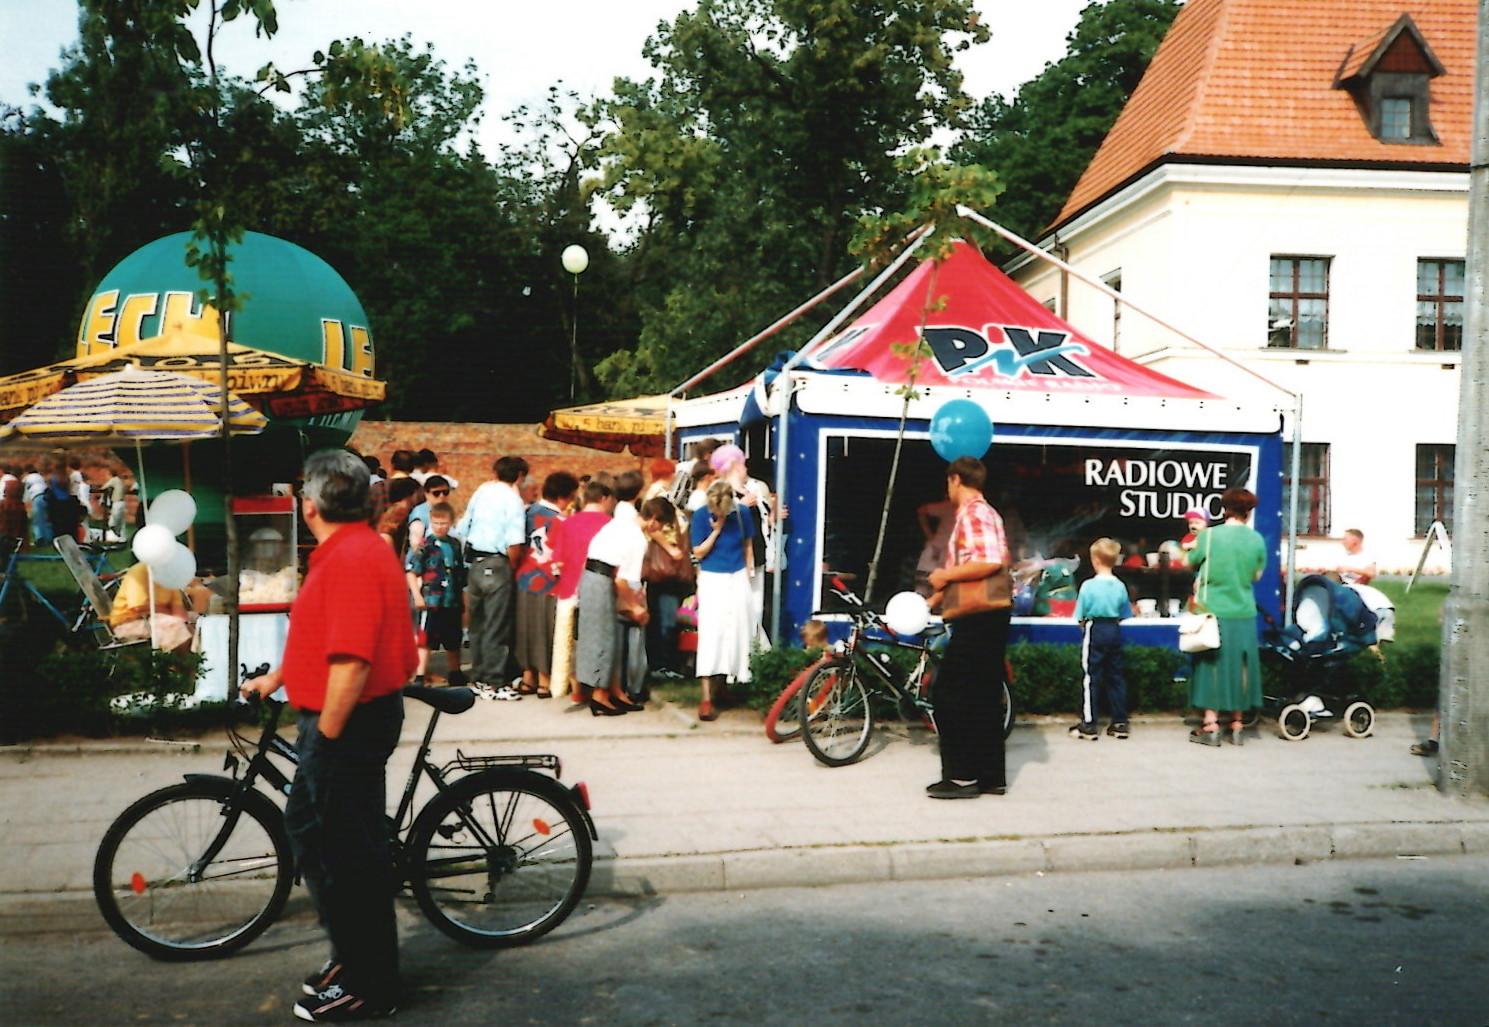 Studio Radiowe w Brodnicy (2000)